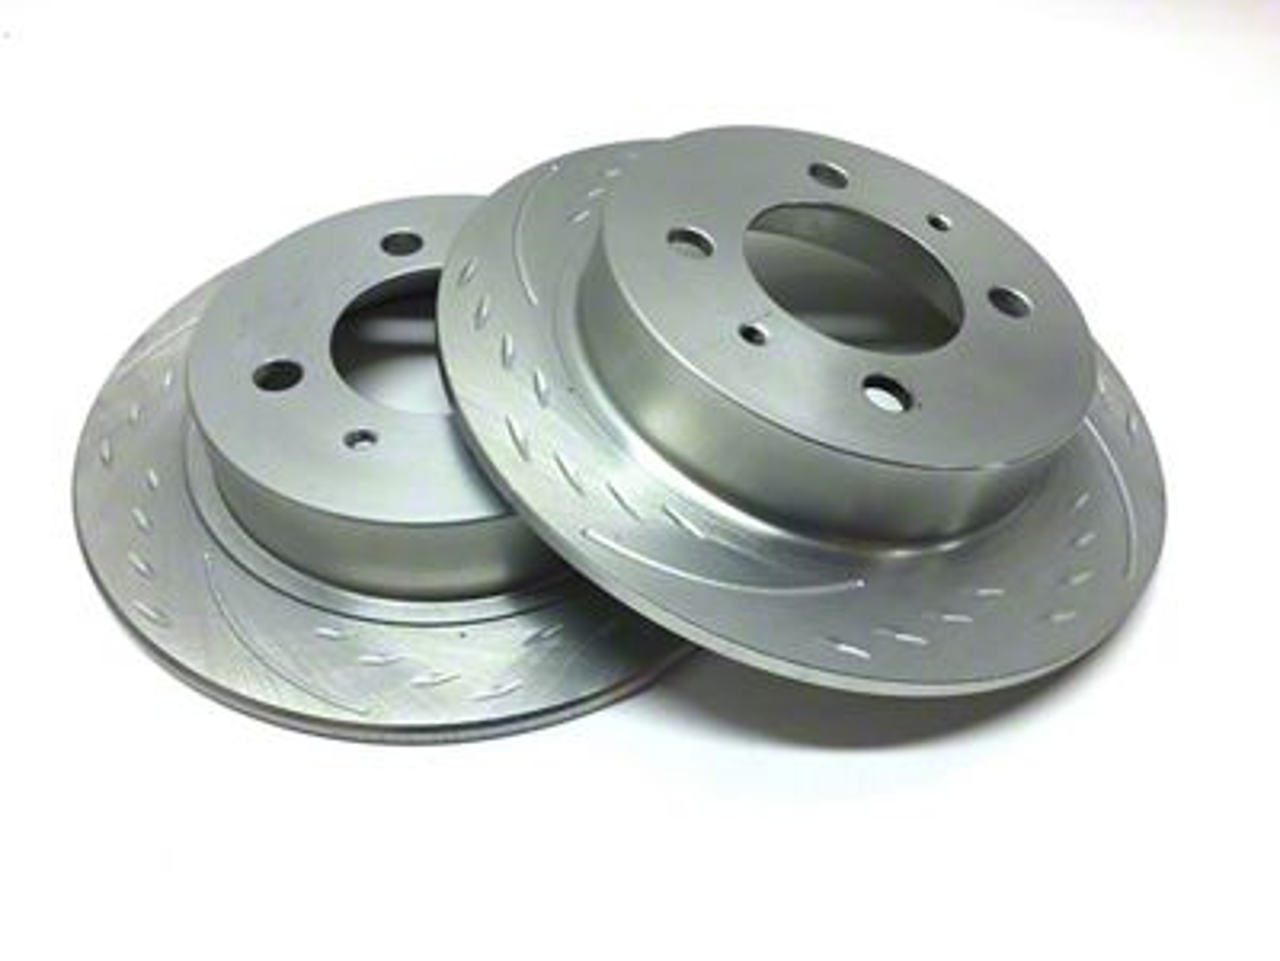 SP Performance Slotted Rotors w/ Silver Zinc Plating - Rear Pair (04-14 F-150; 15-18 F-150 w/ Manual Parking Brake)